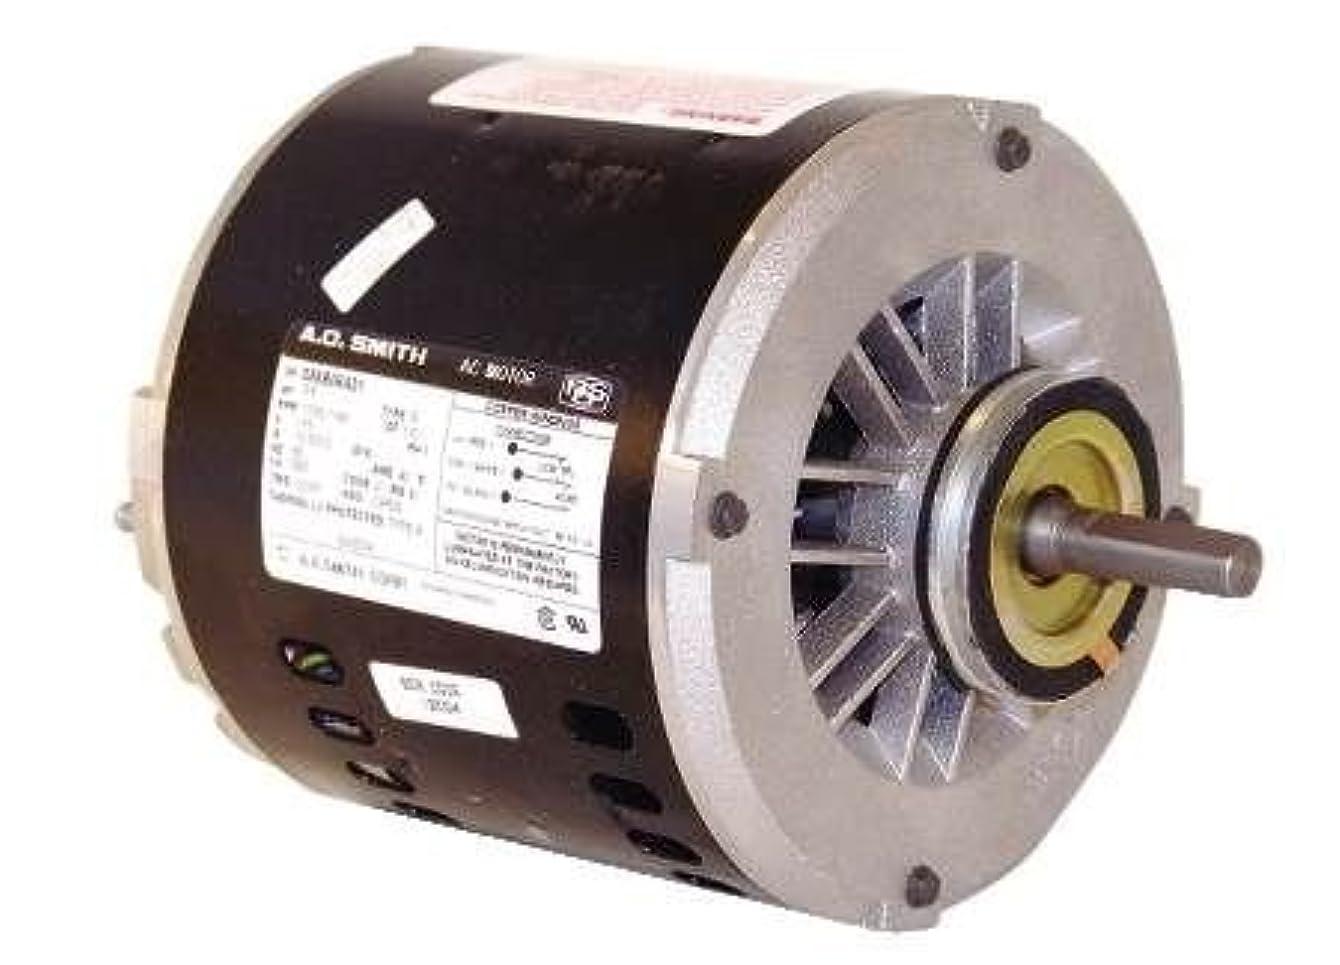 Century SV2104L Single Phase 2 hp 1725 rpm 115V Evaporative Cooler Motor